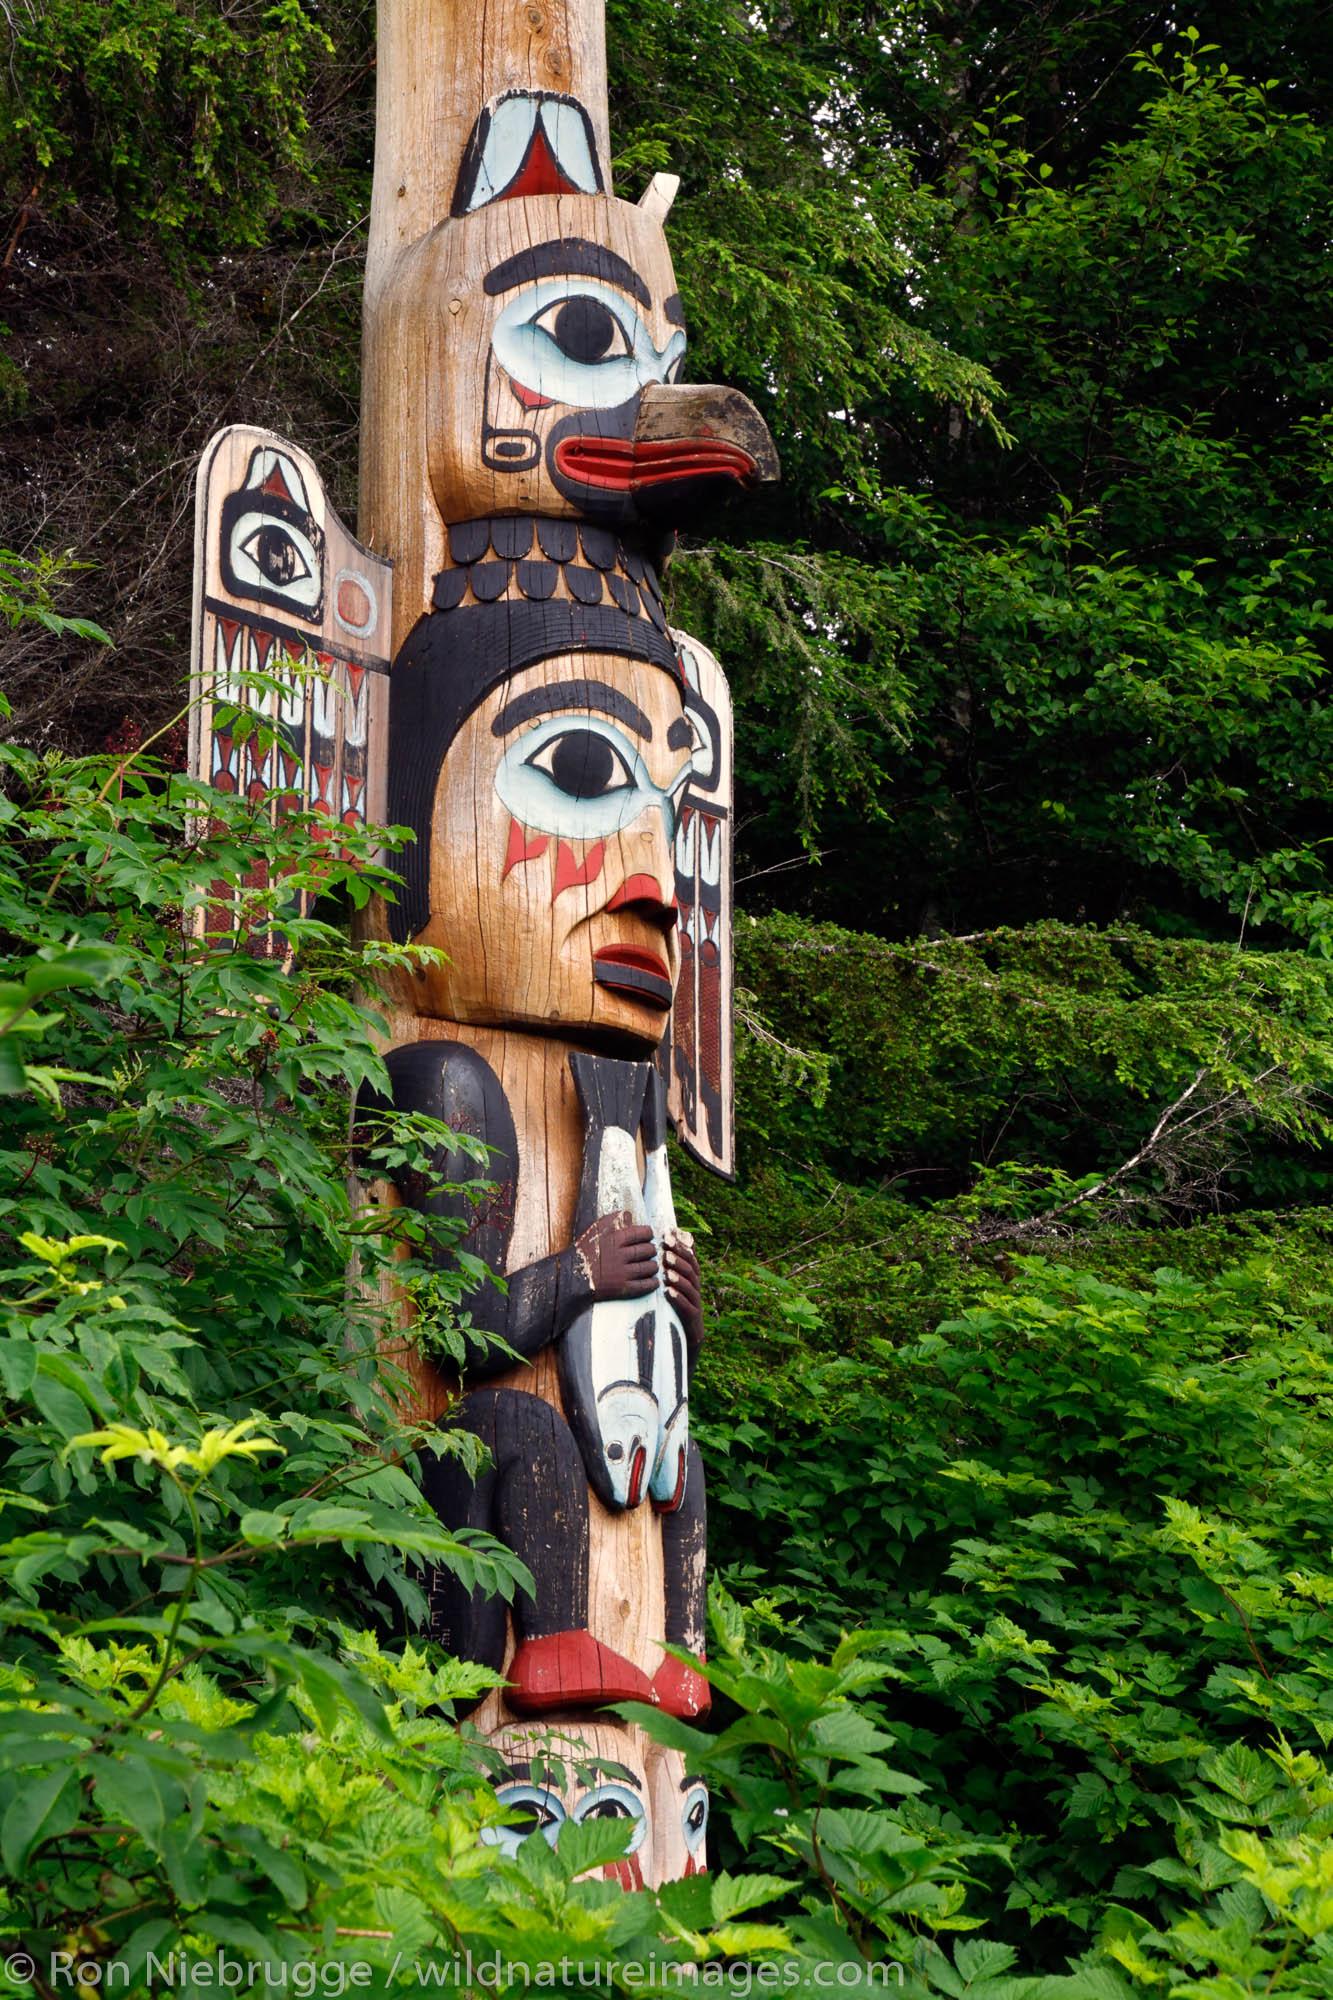 The base of the Kadjuk Bird Pole (pole 12), Totem Bight State Historical Park, Ketchikan, Alaska